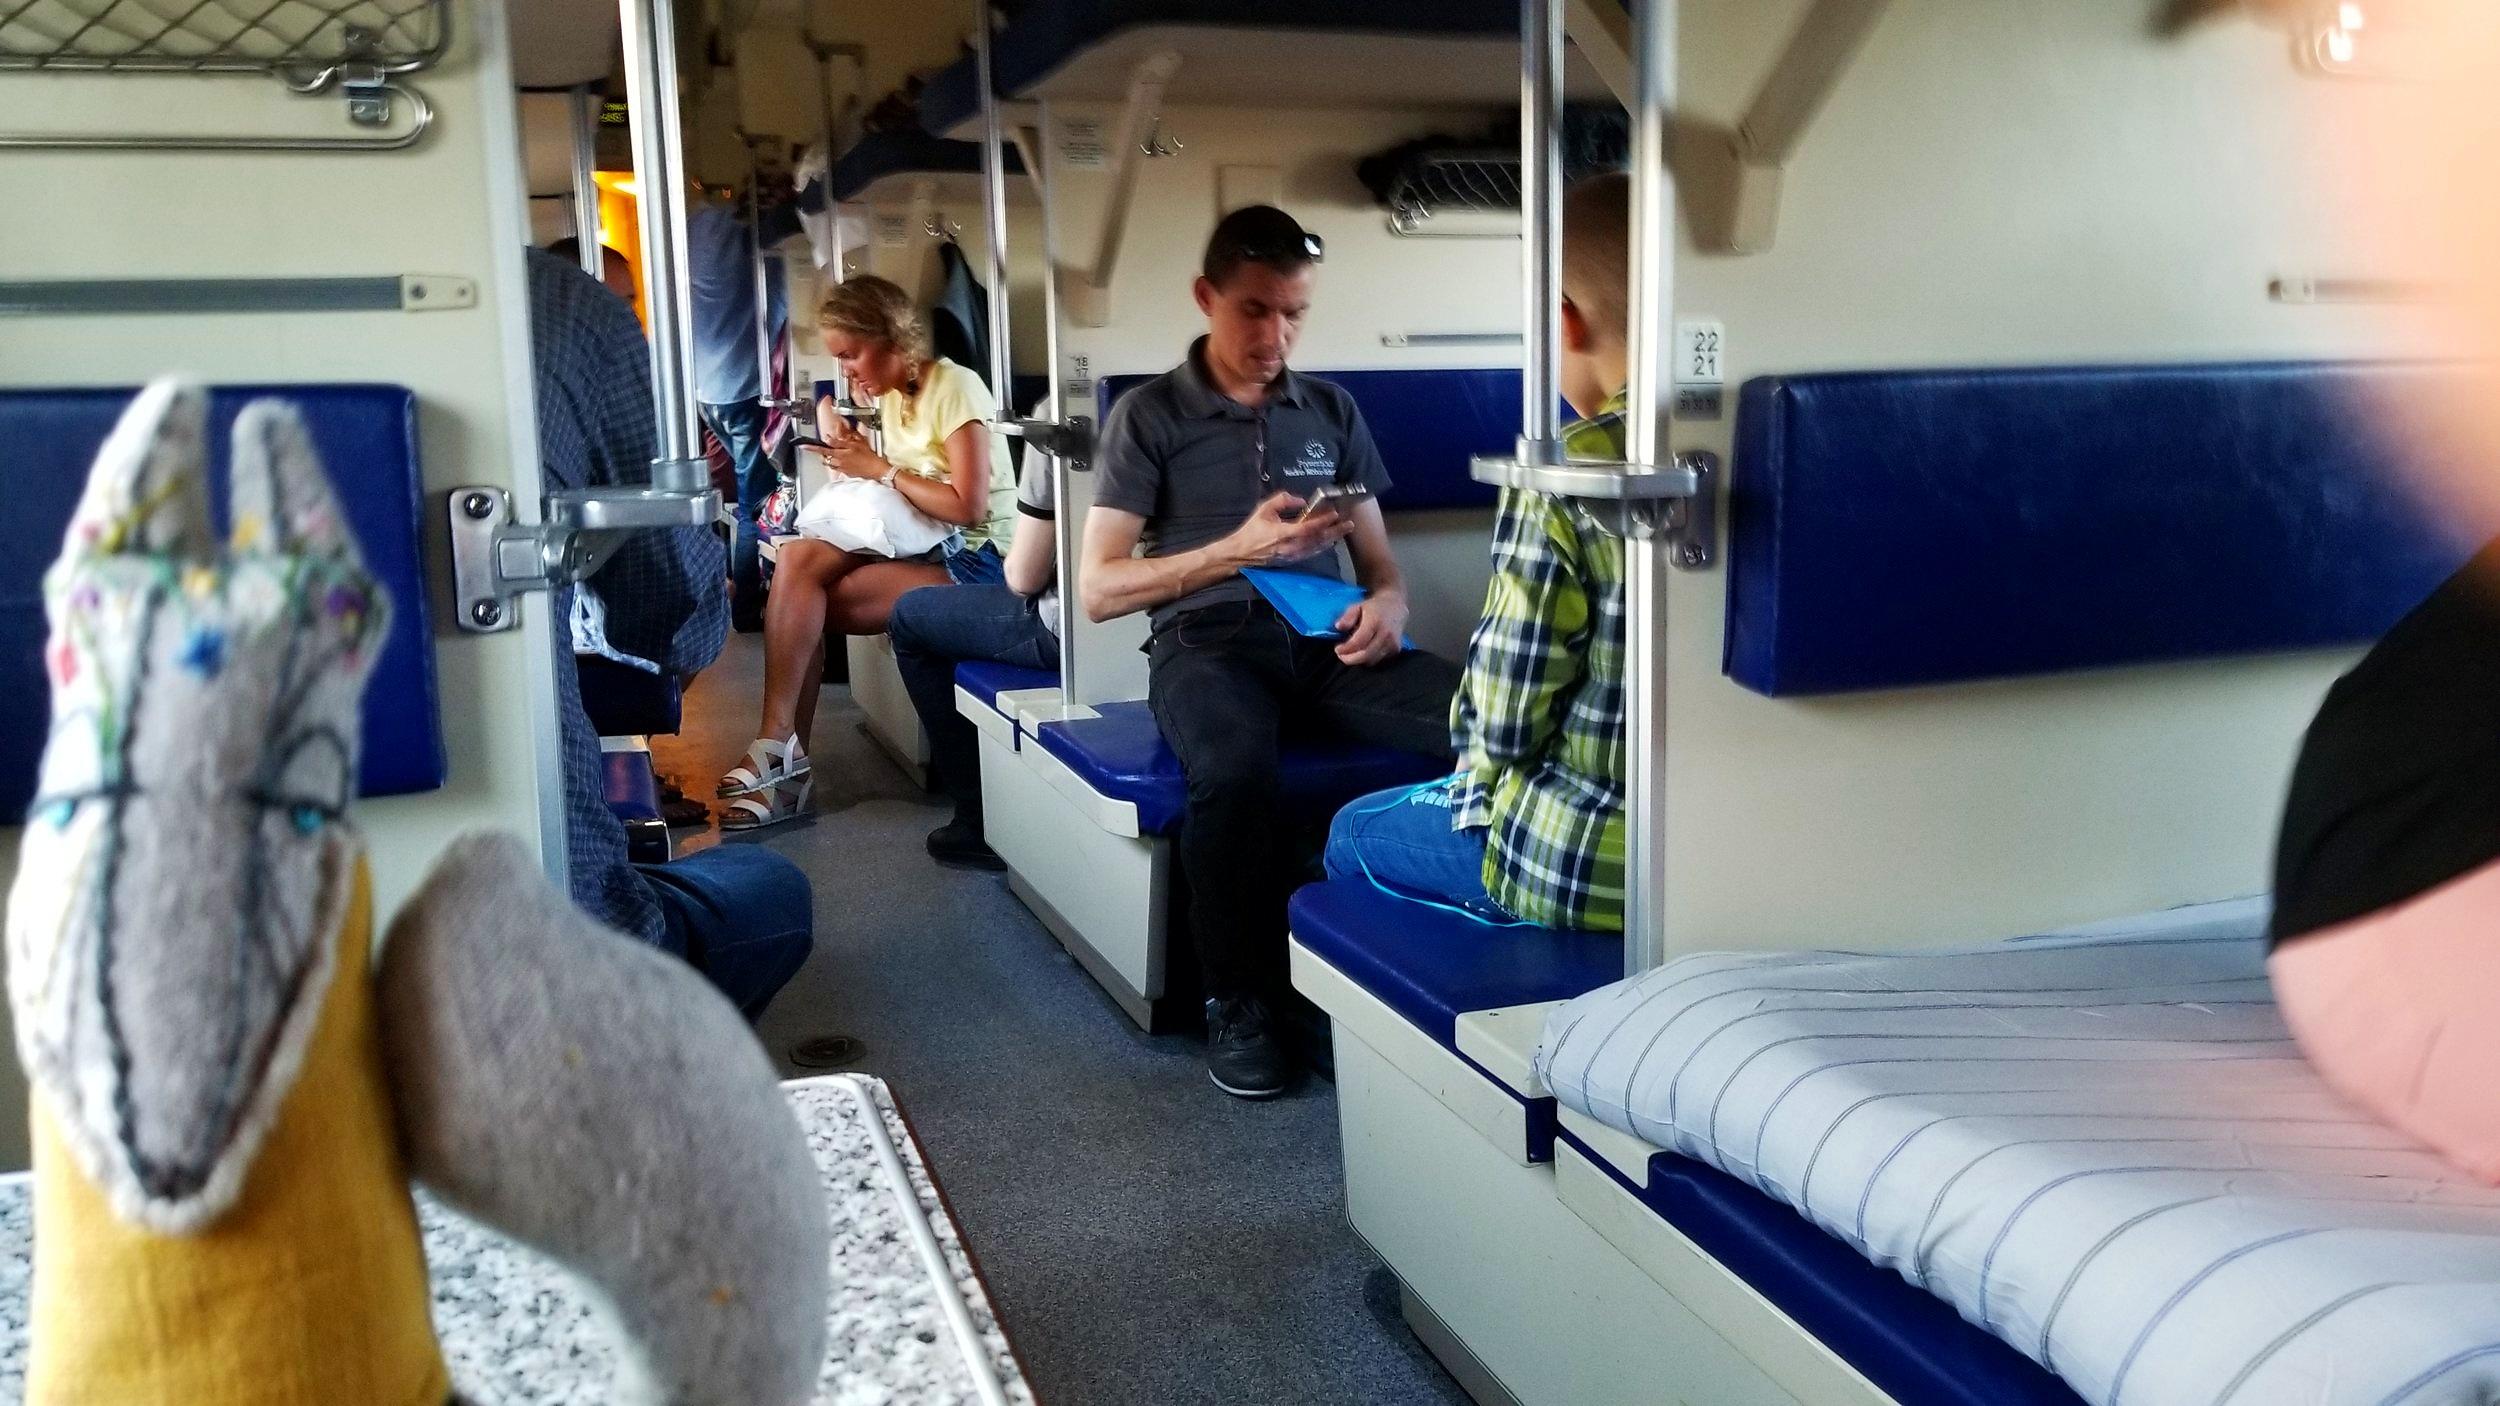 Russian train from Petrozavodsk to Murmansk